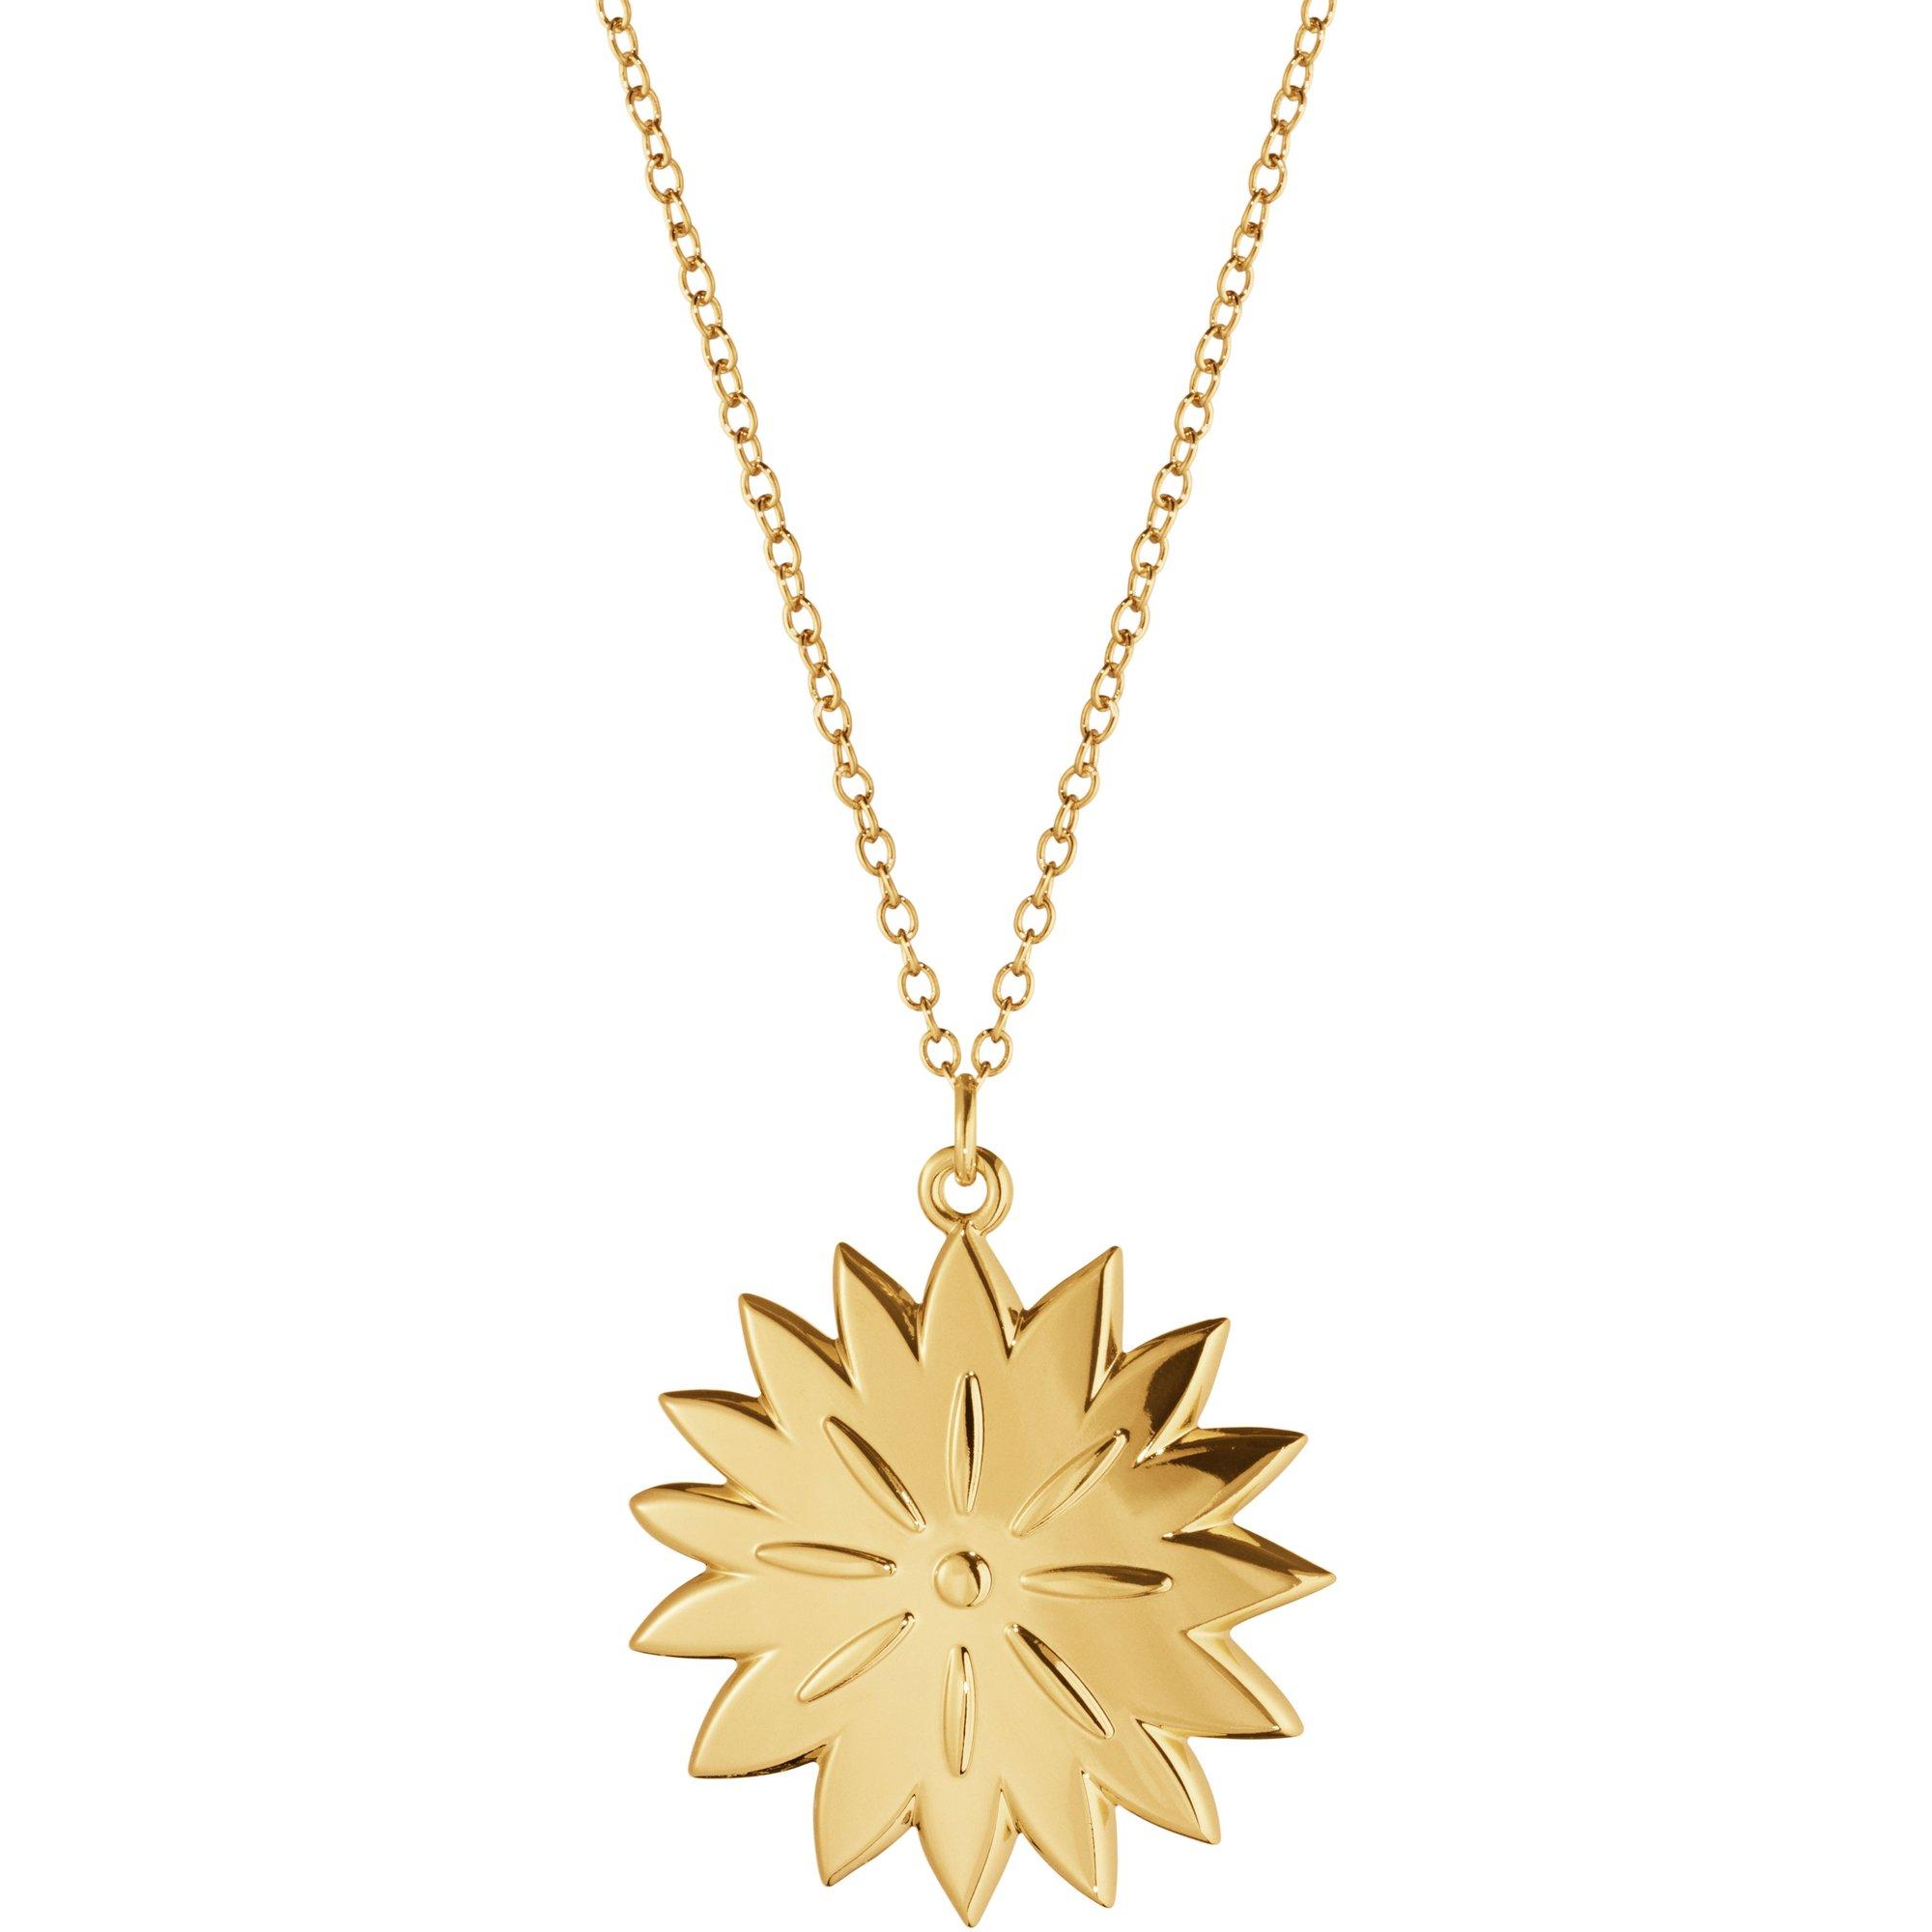 Georg Jensen 2020 Ornament Ice Dianthus guld